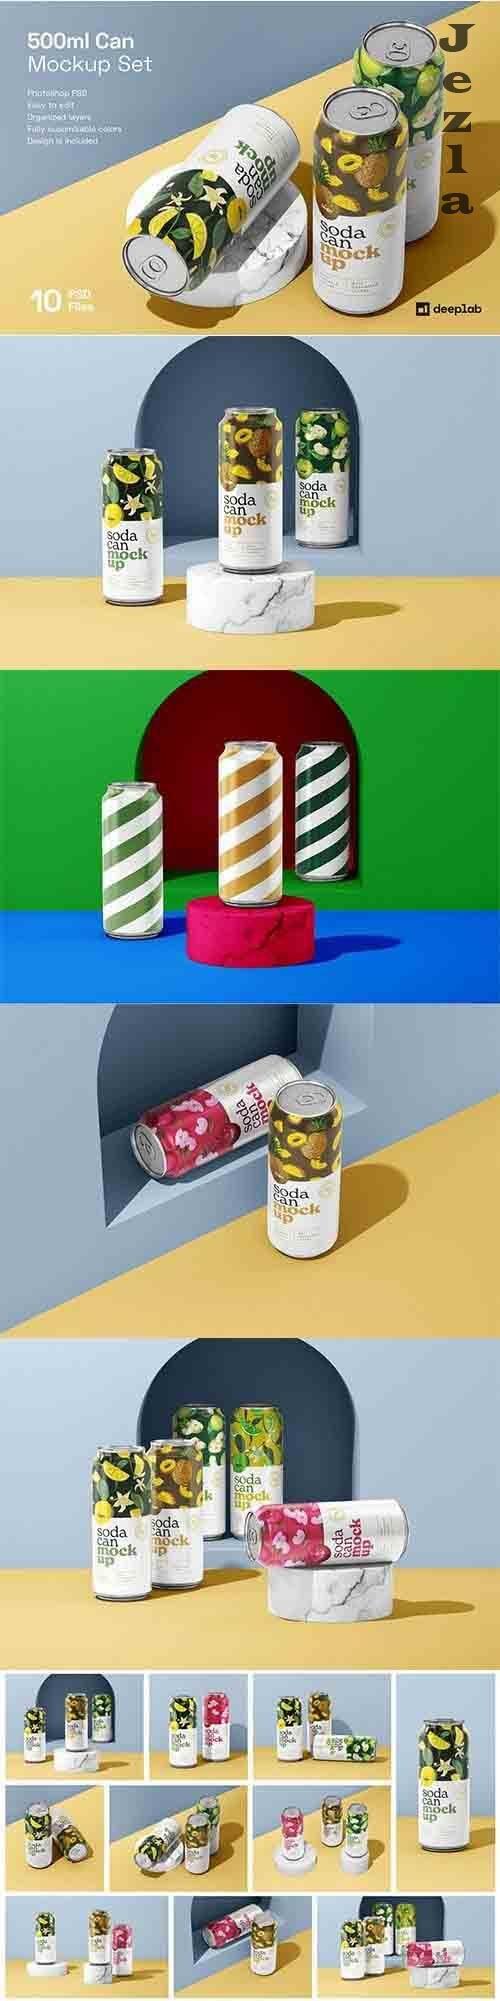 CreativeMarket - 500ML Soda Can Mockup Set 6012916